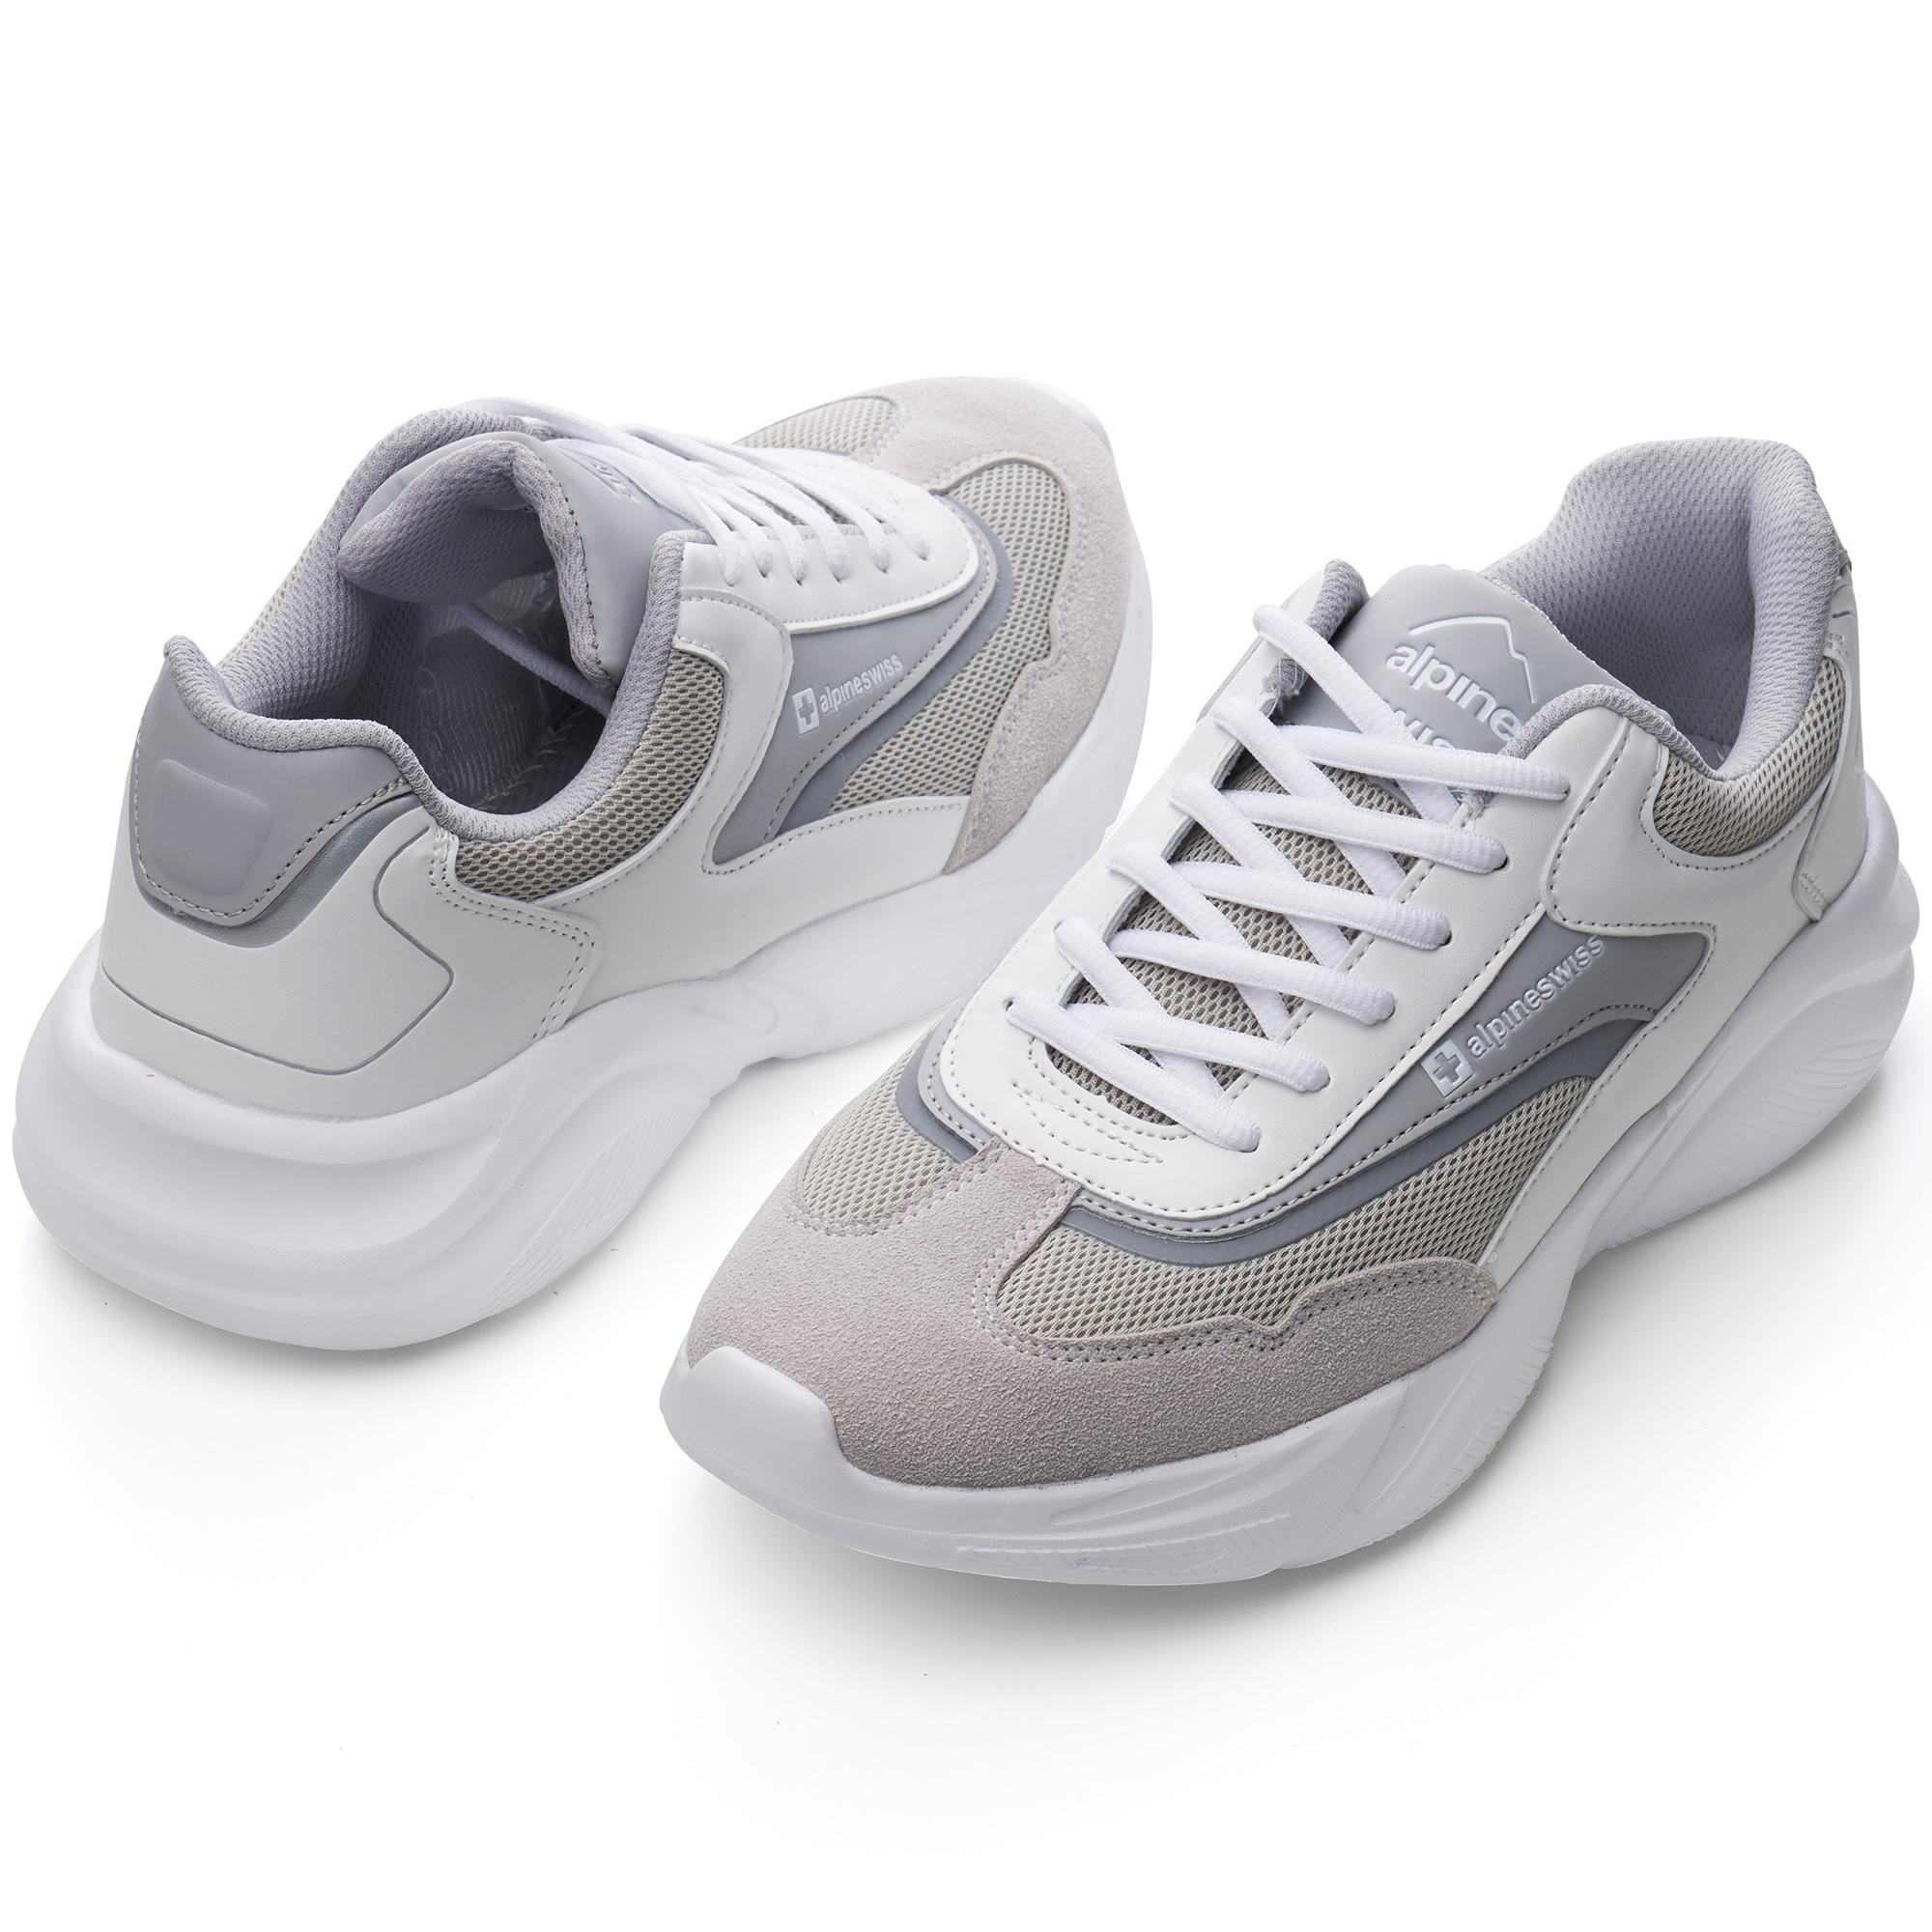 Alpine-Swiss-Stuart-Mens-Chunky-Sneakers-Retro-Platform-Dad-Tennis-Shoes thumbnail 39